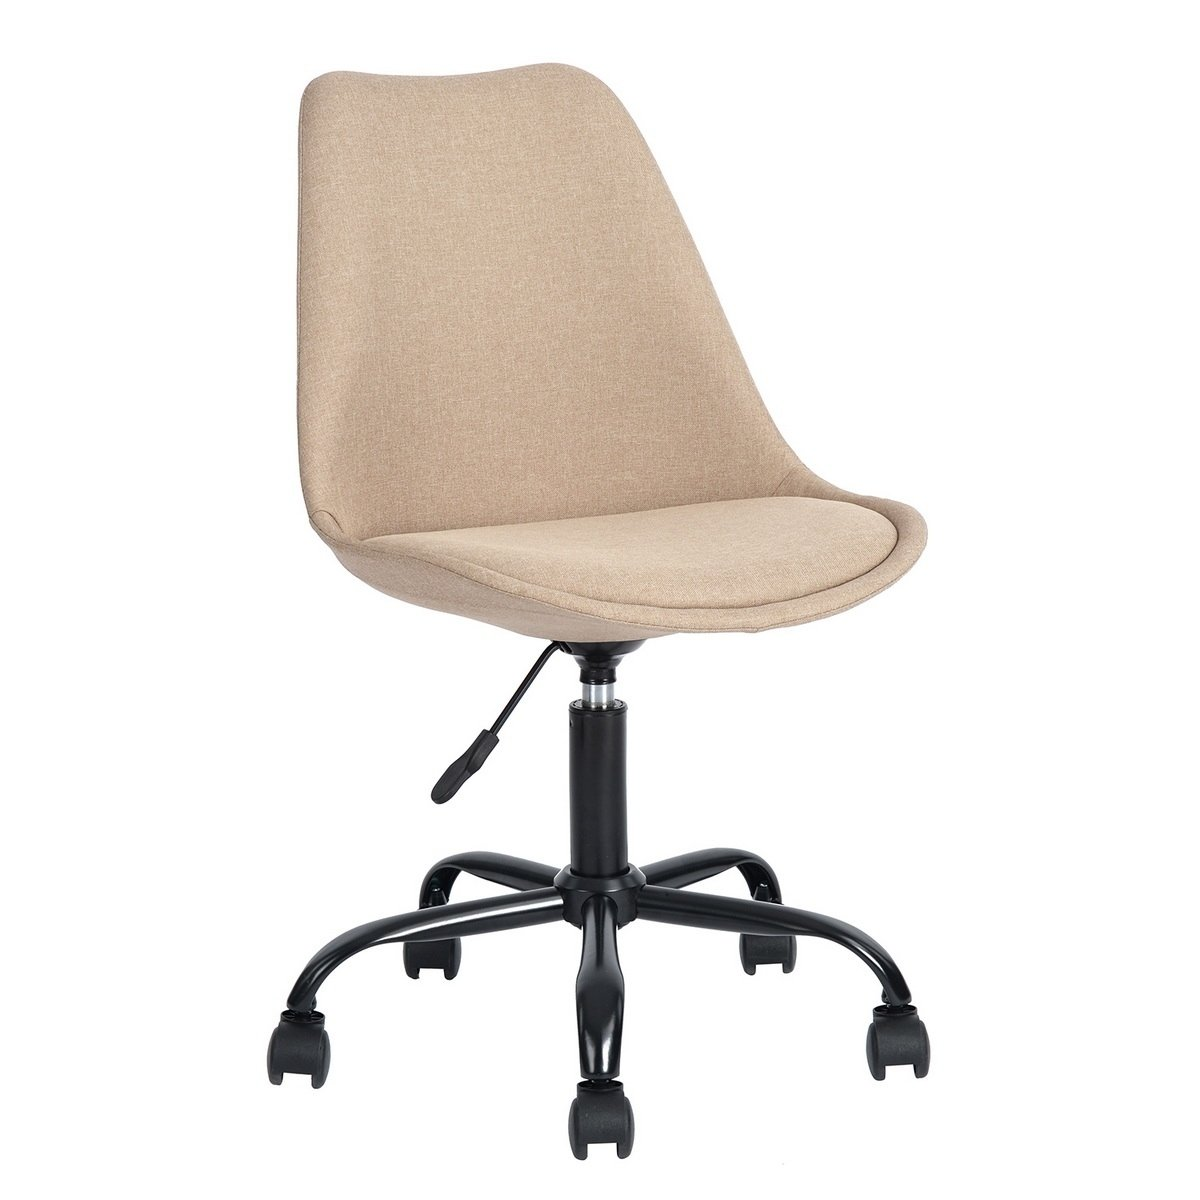 Furniturer Home Office Task Chair Armless Swivel Brown Best Office Chair Office Chair Task Chair